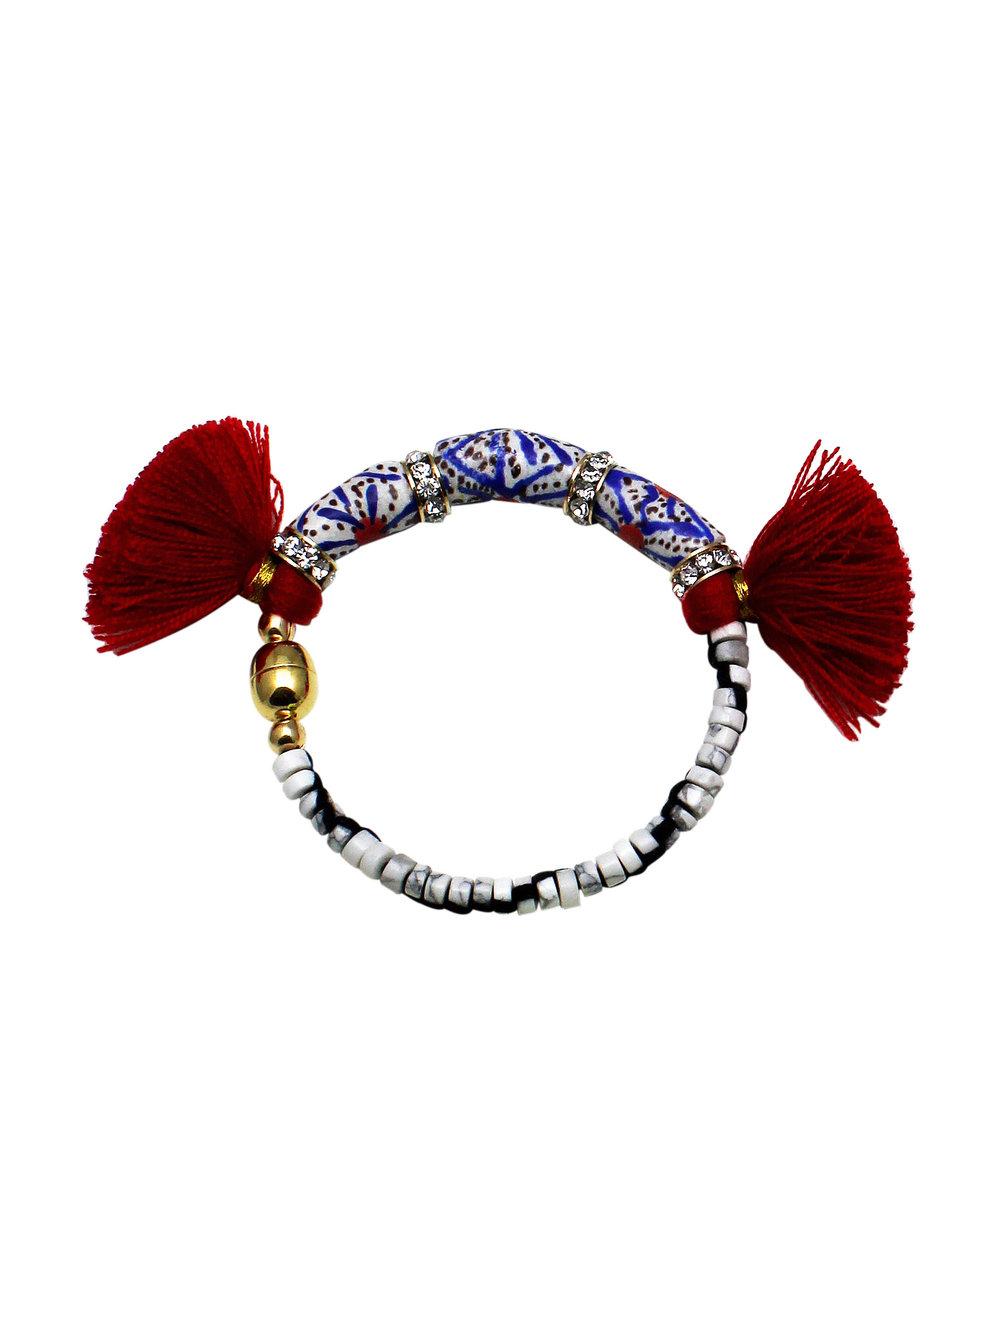 B 198B Maasai Batik Bracelet.jpg